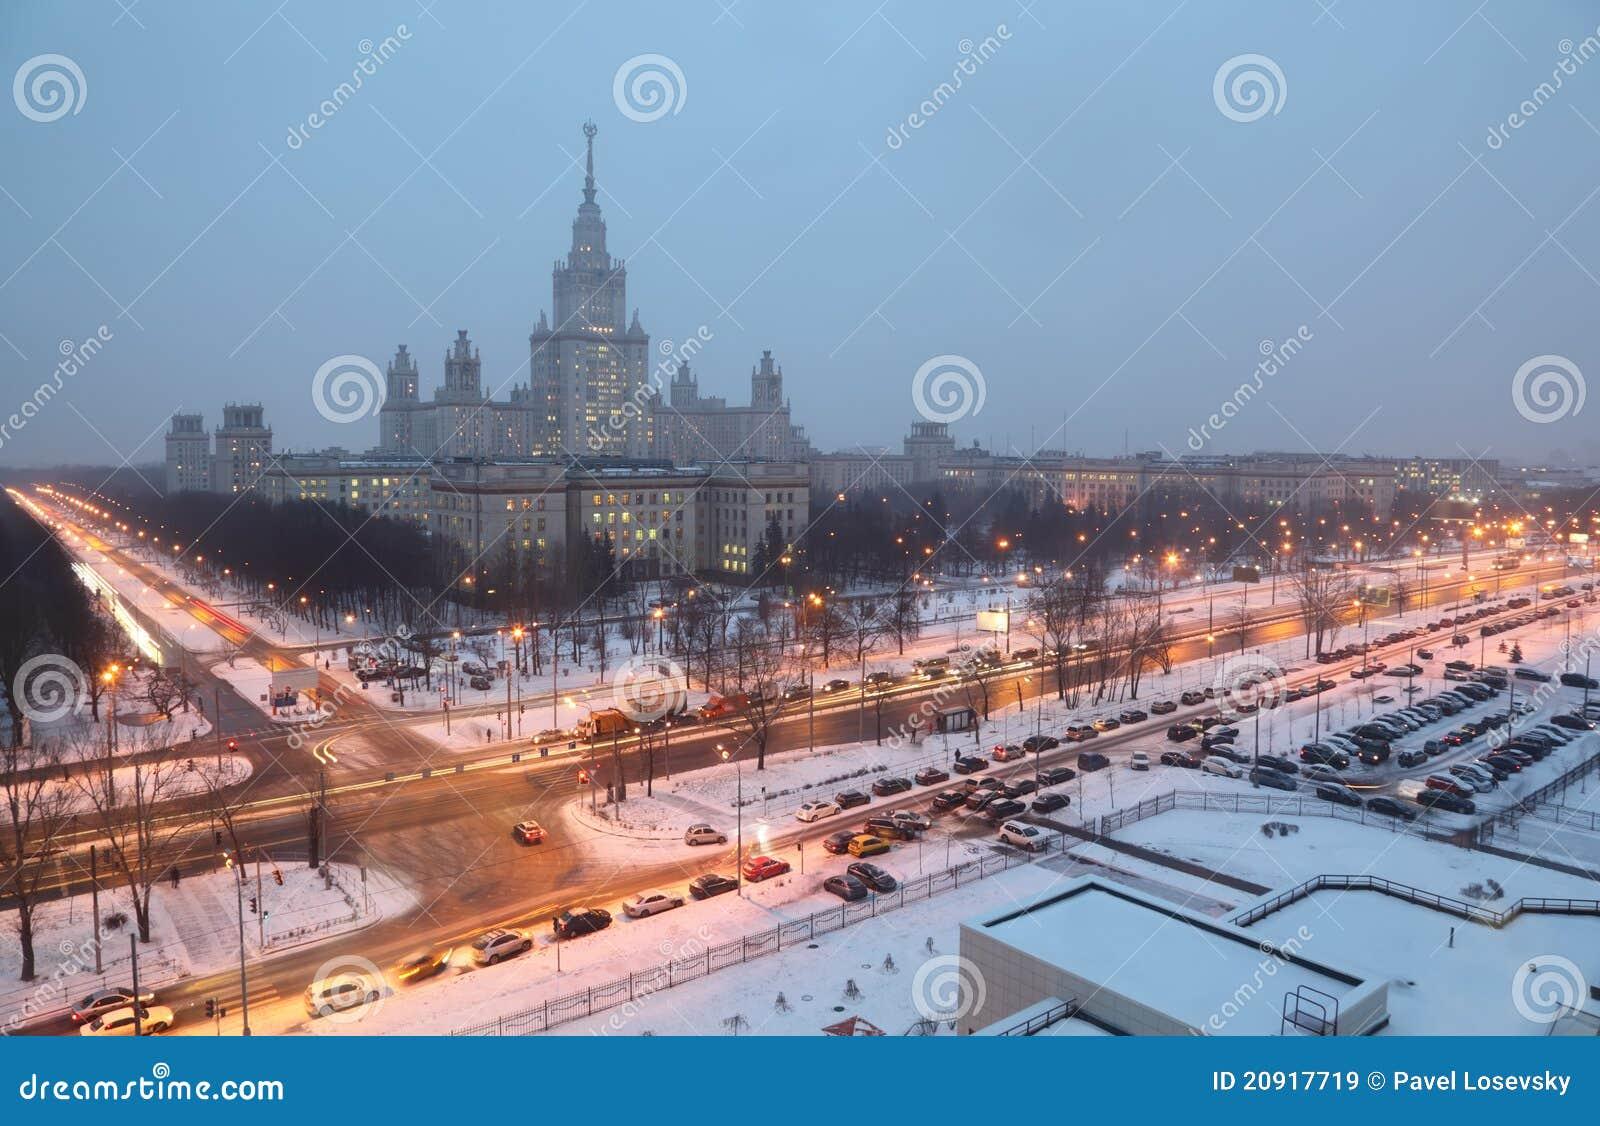 Main Russian University And 13